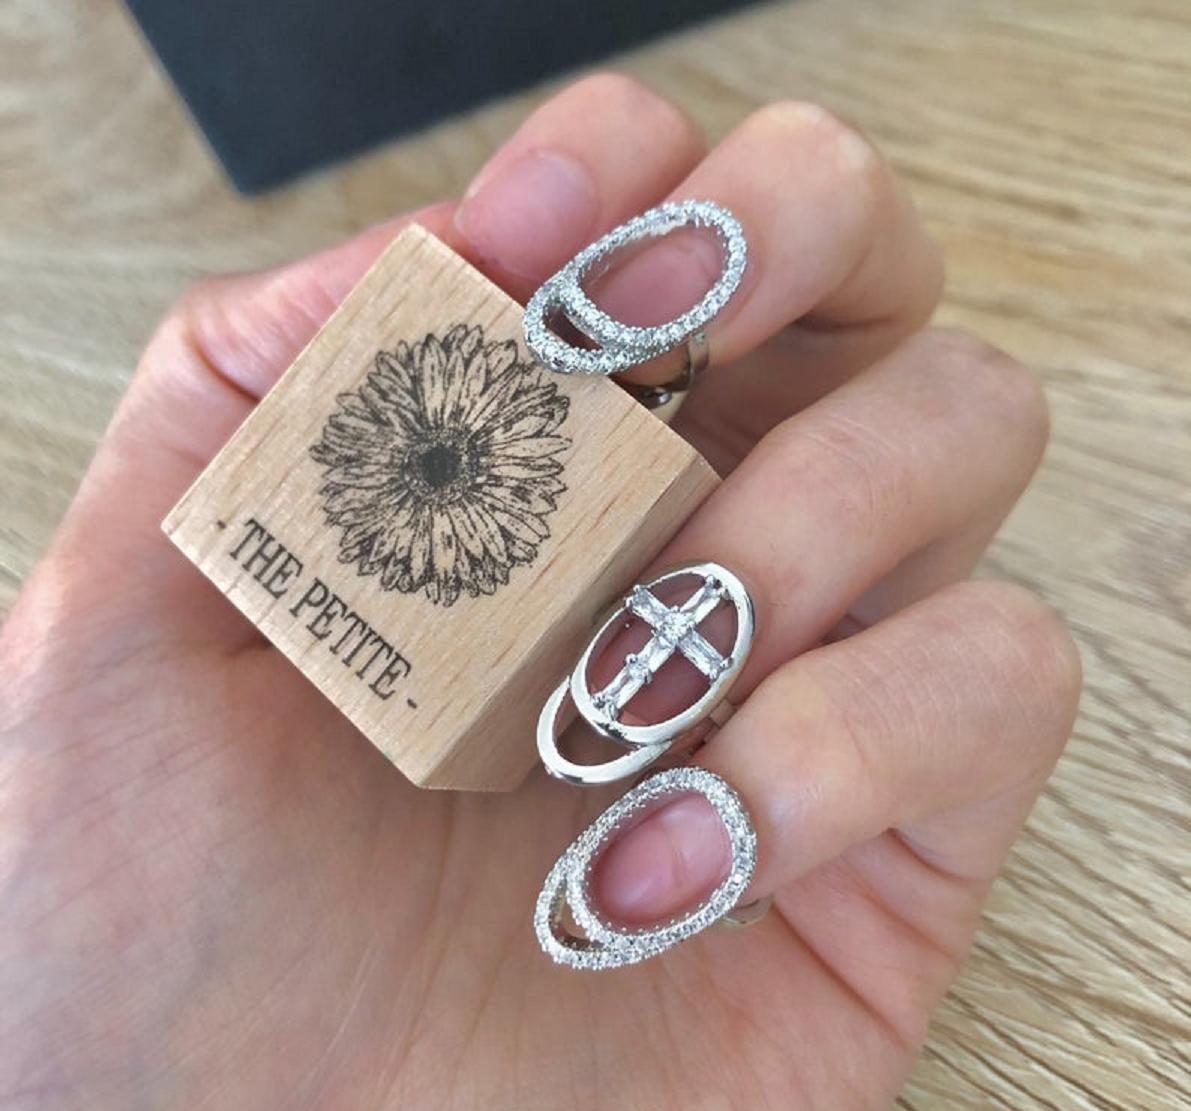 Nail ring bling Ruthless Fingertip Nail Rings with Rhinestones